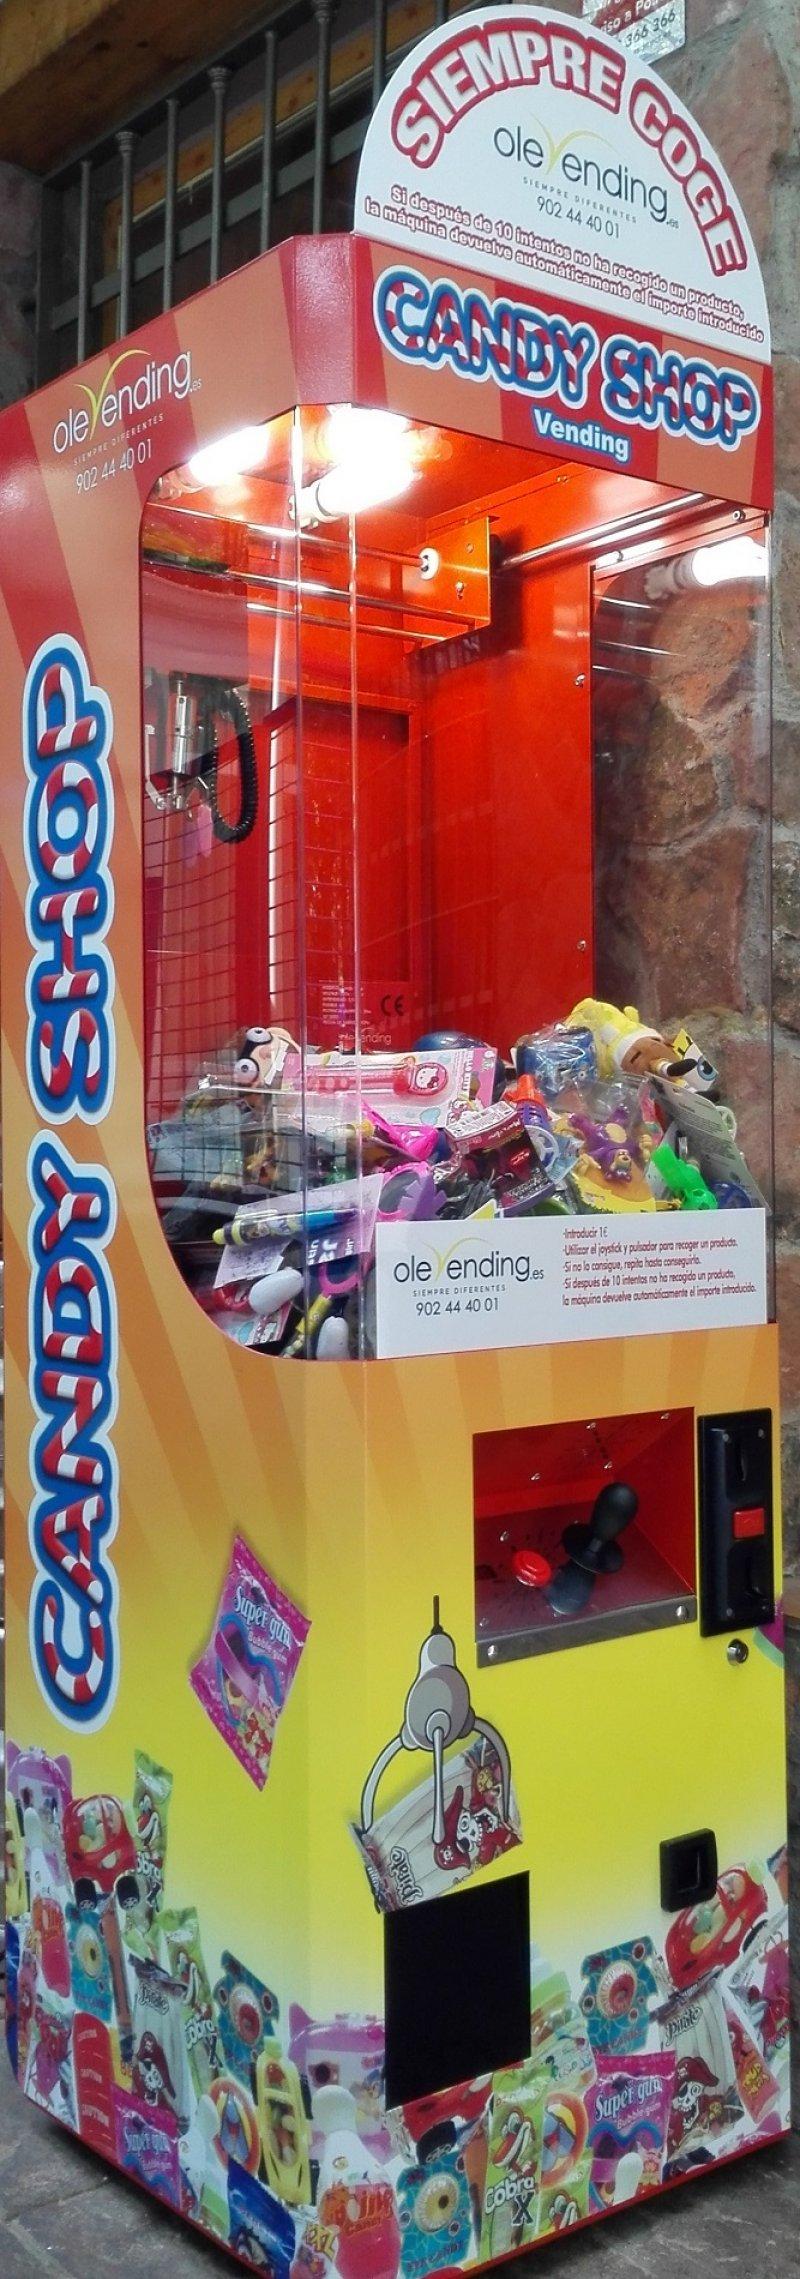 Candy Shop Vending - Venta